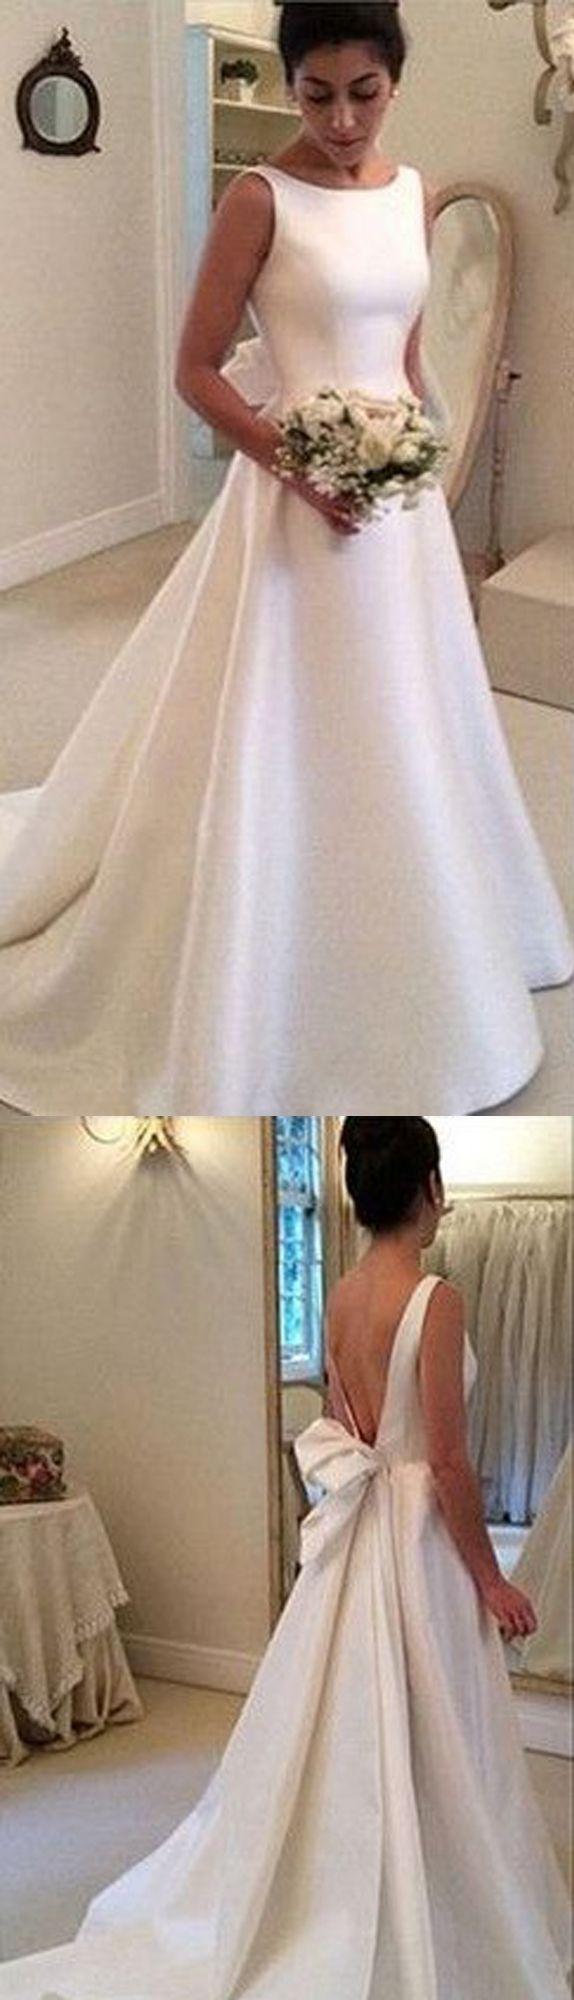 Satin Wedding Dresses,A-Line Formal Wedding Dress, Simple Wedding Dress, Backless Wedding Dresses, Elegant Vintage Women Wedding Gown 2017